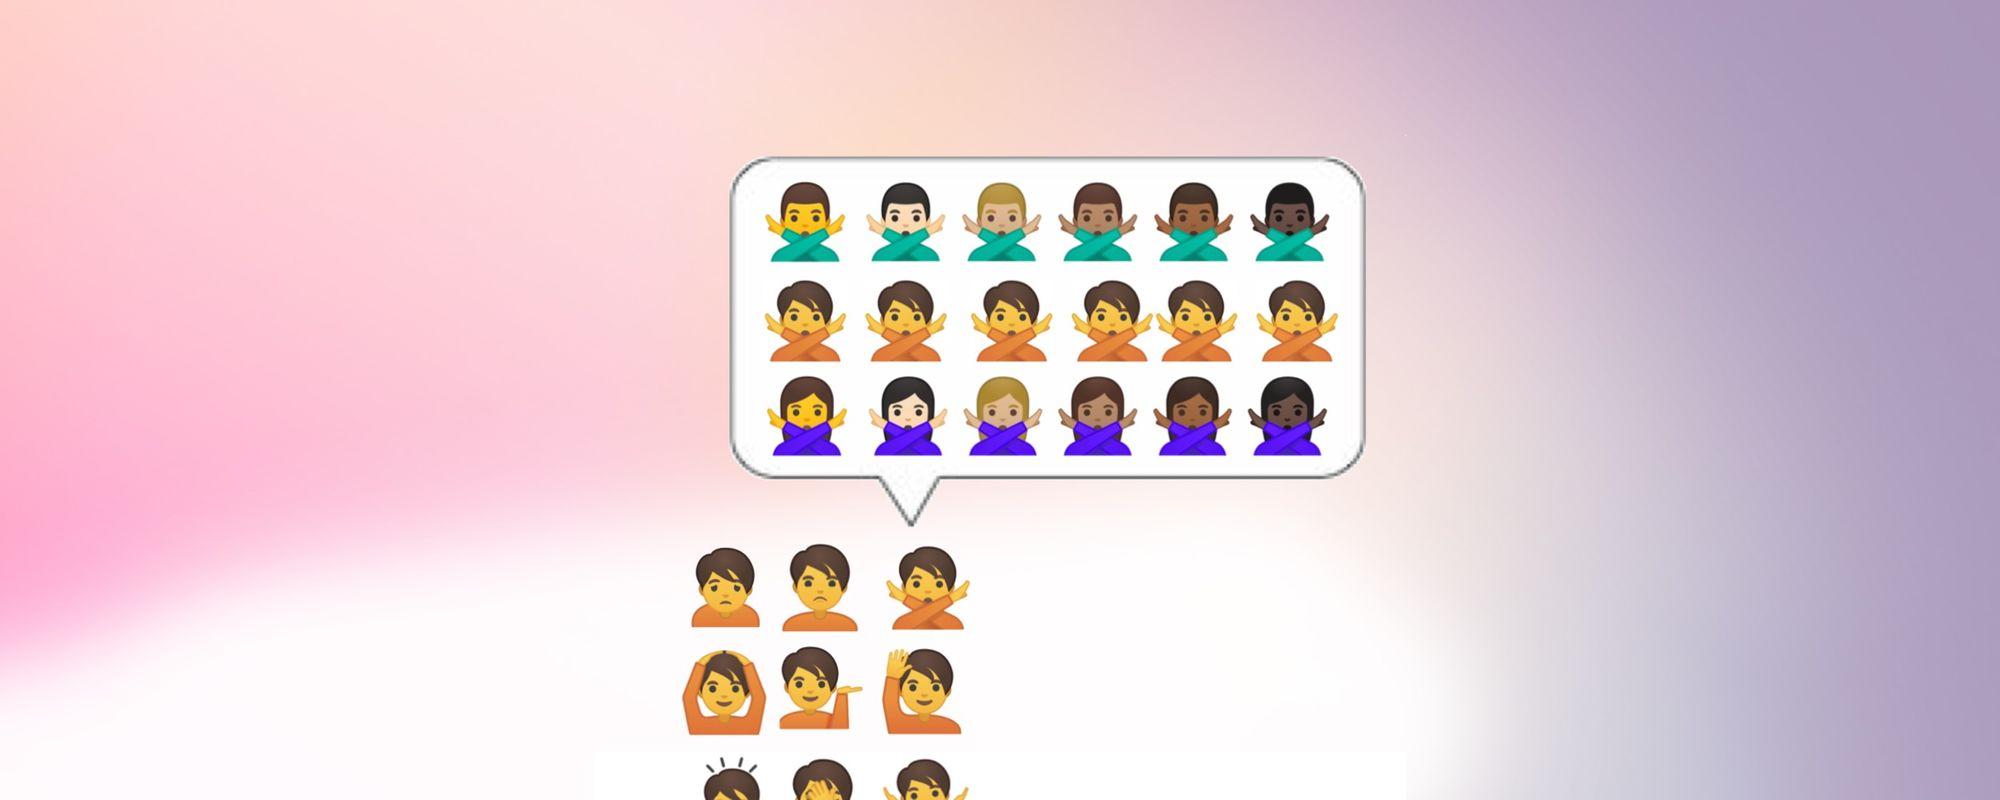 Google's Three Gender Emoji Future